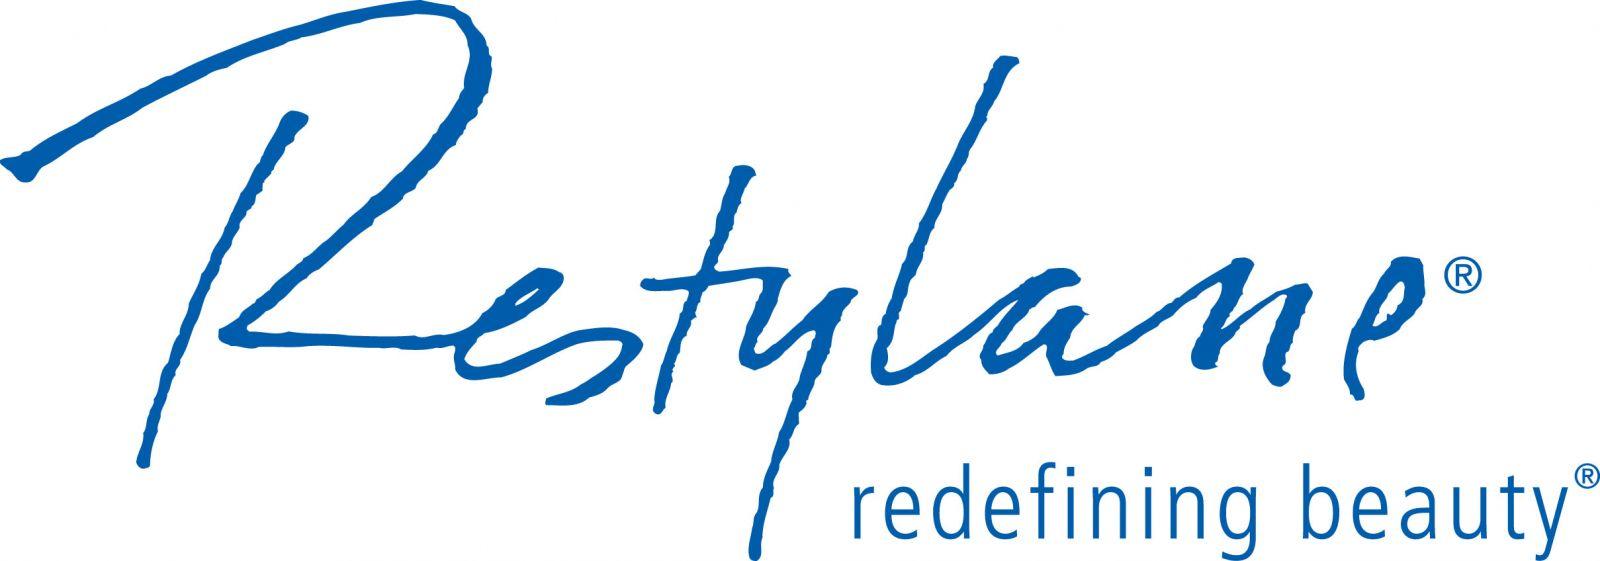 Restylane®